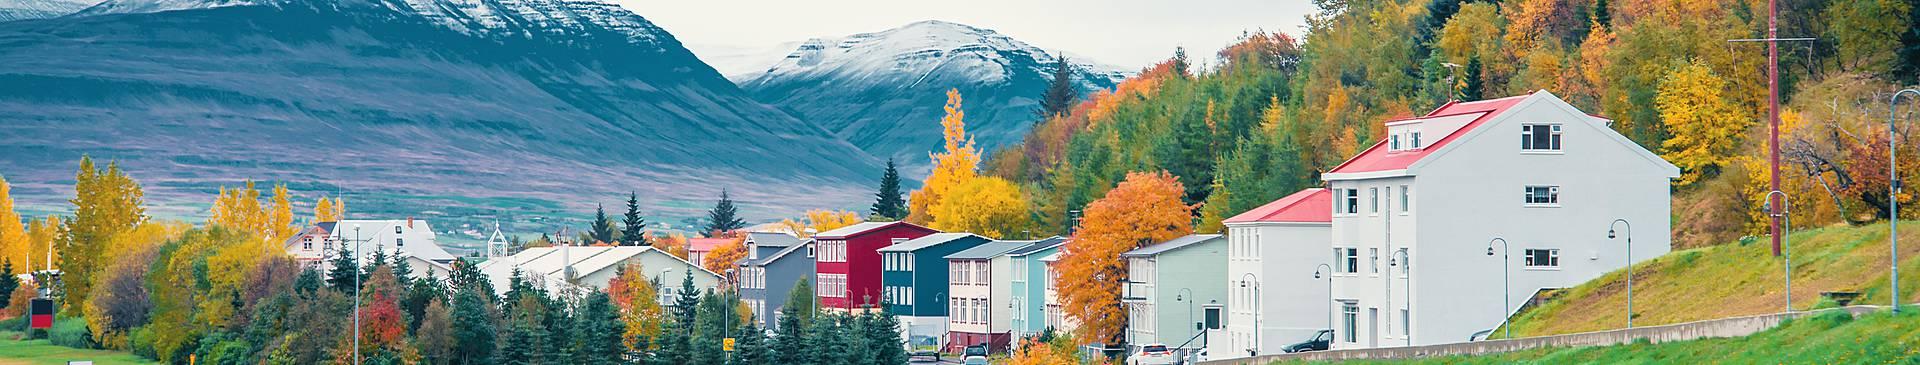 Viajes a Islandia en otoño